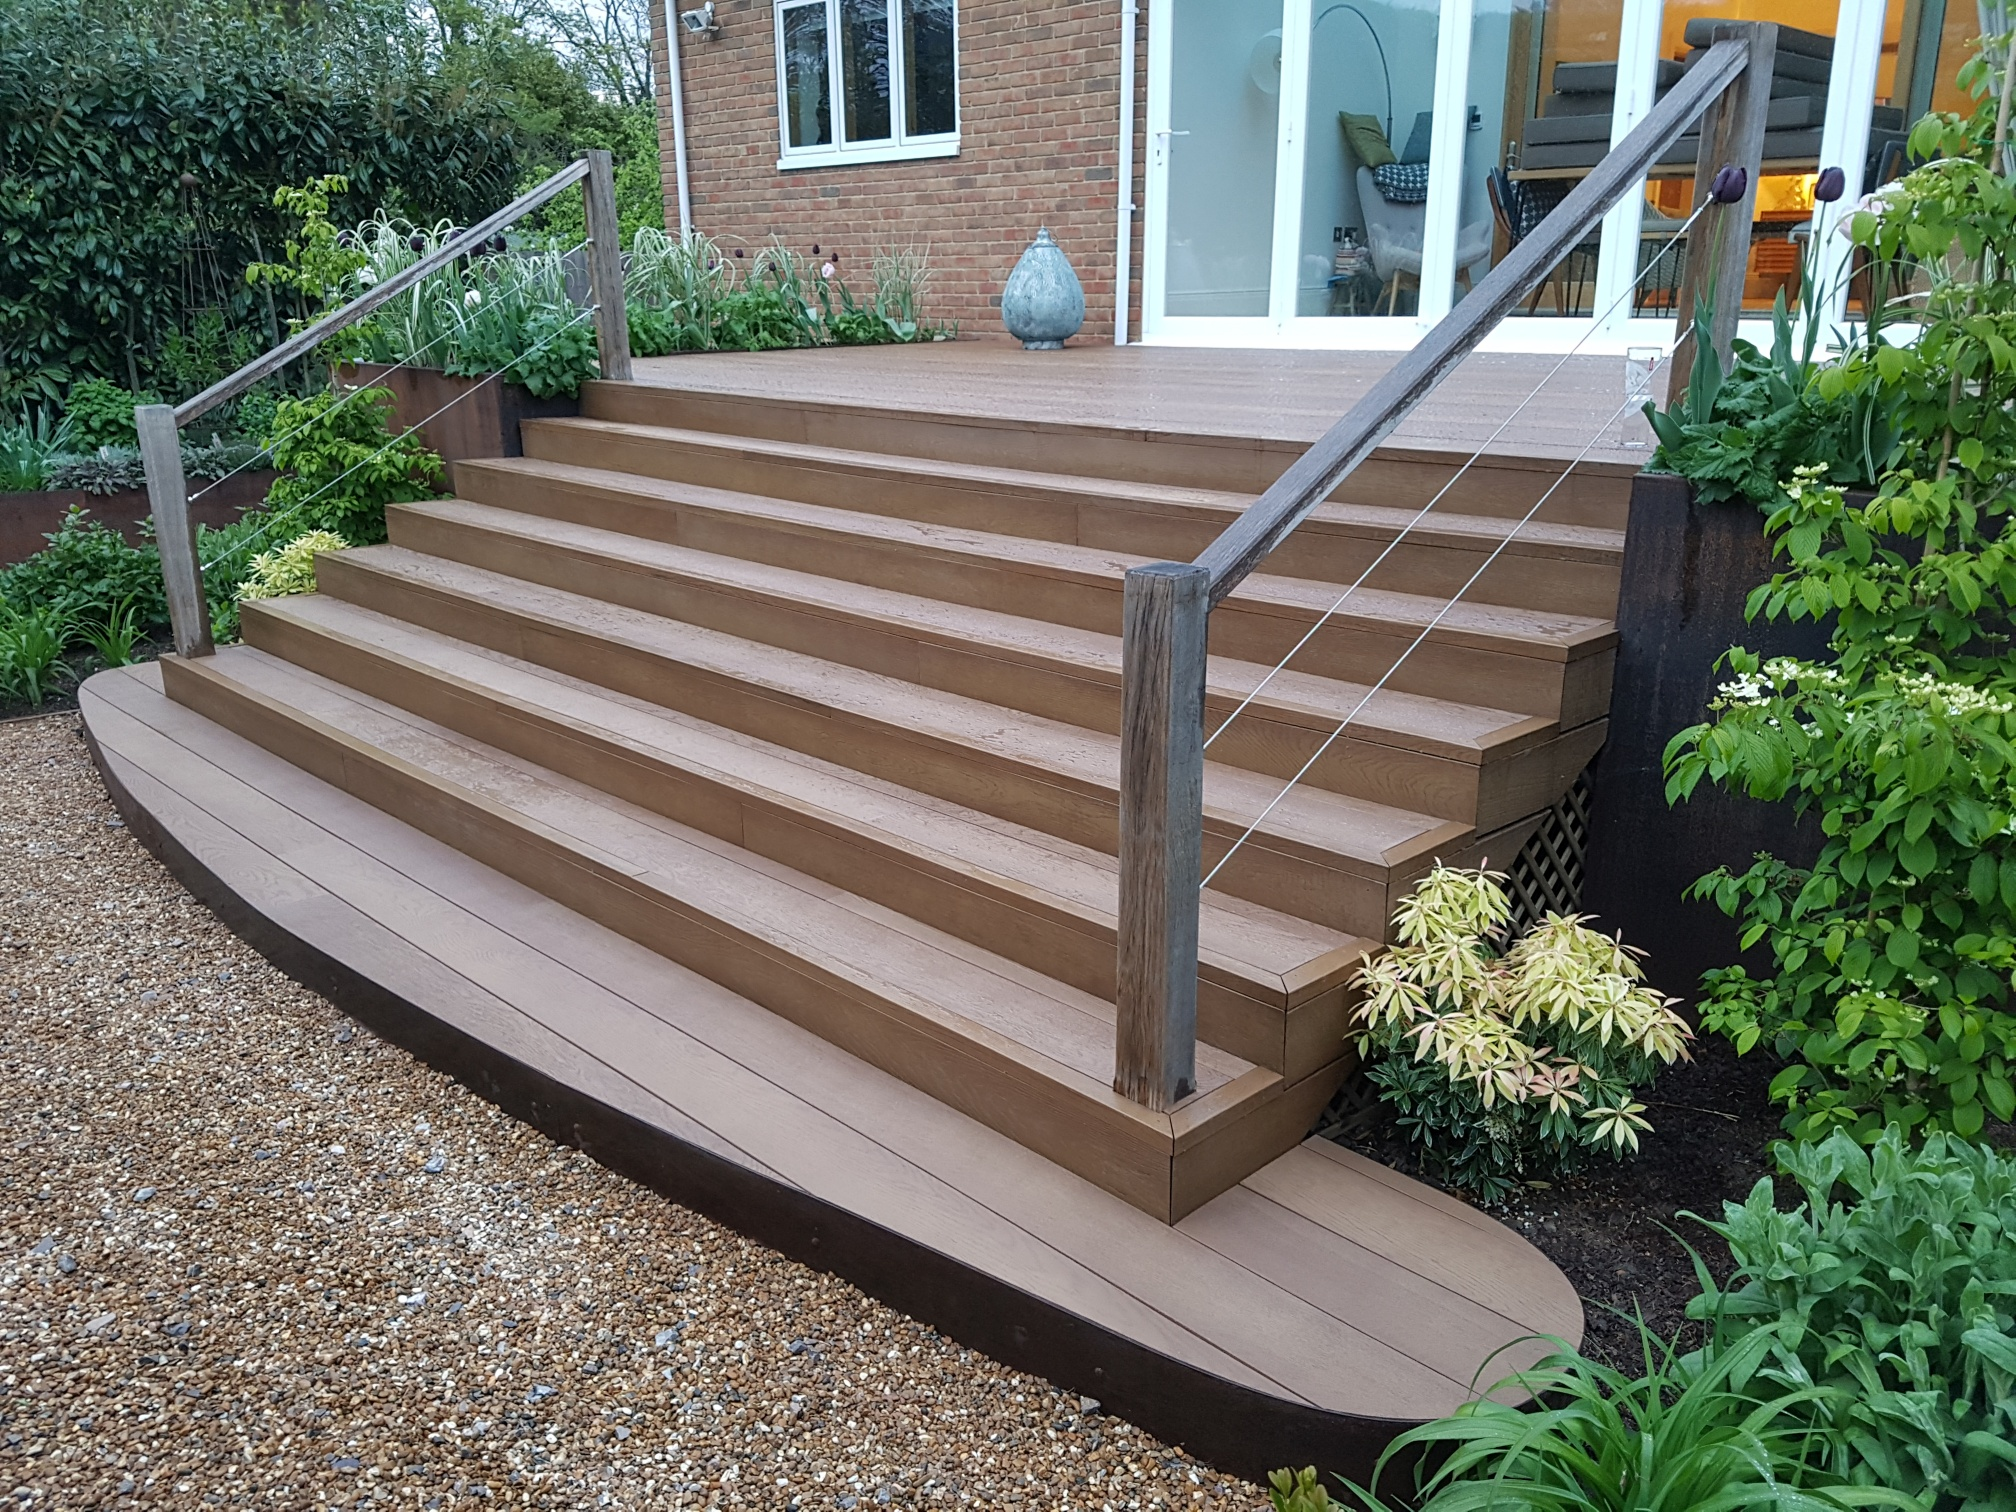 Millboard-decking-composite-decking-dorchester-dorset